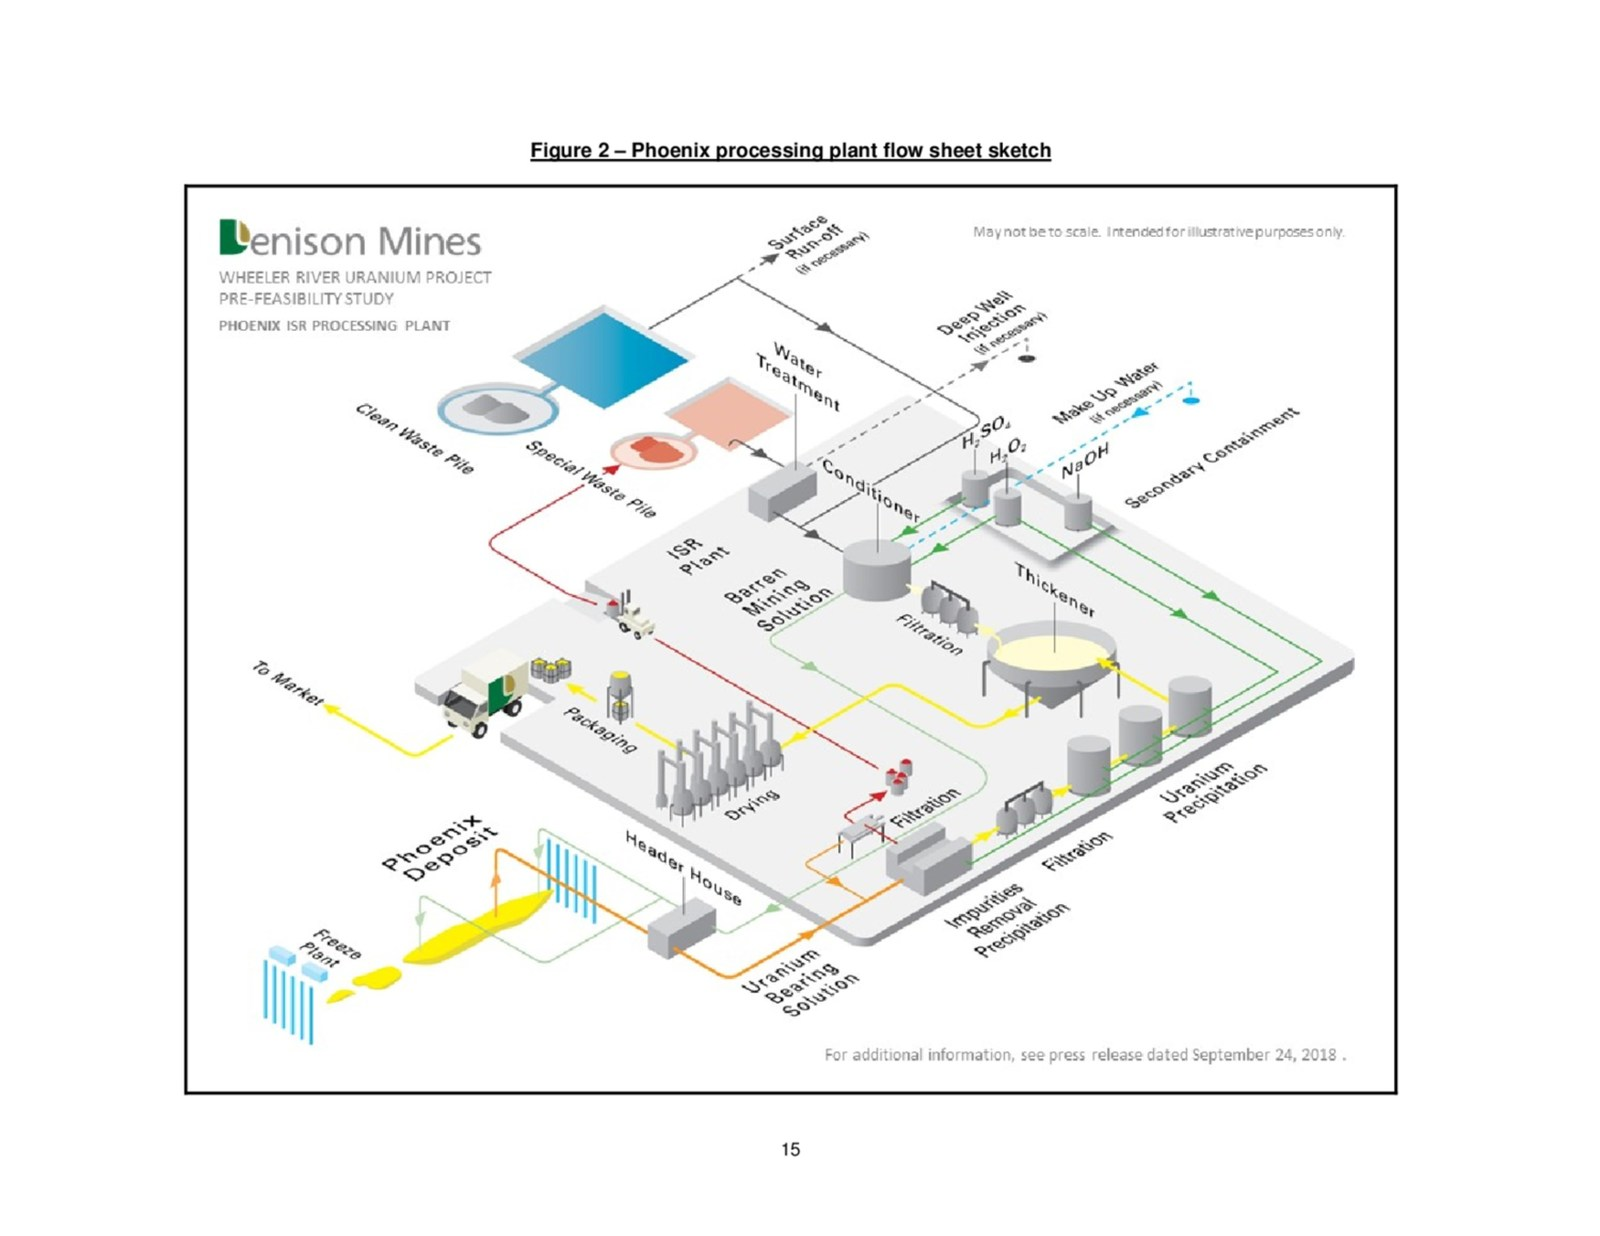 Figure 2 - Phoenix processing plant flow sheet sketch